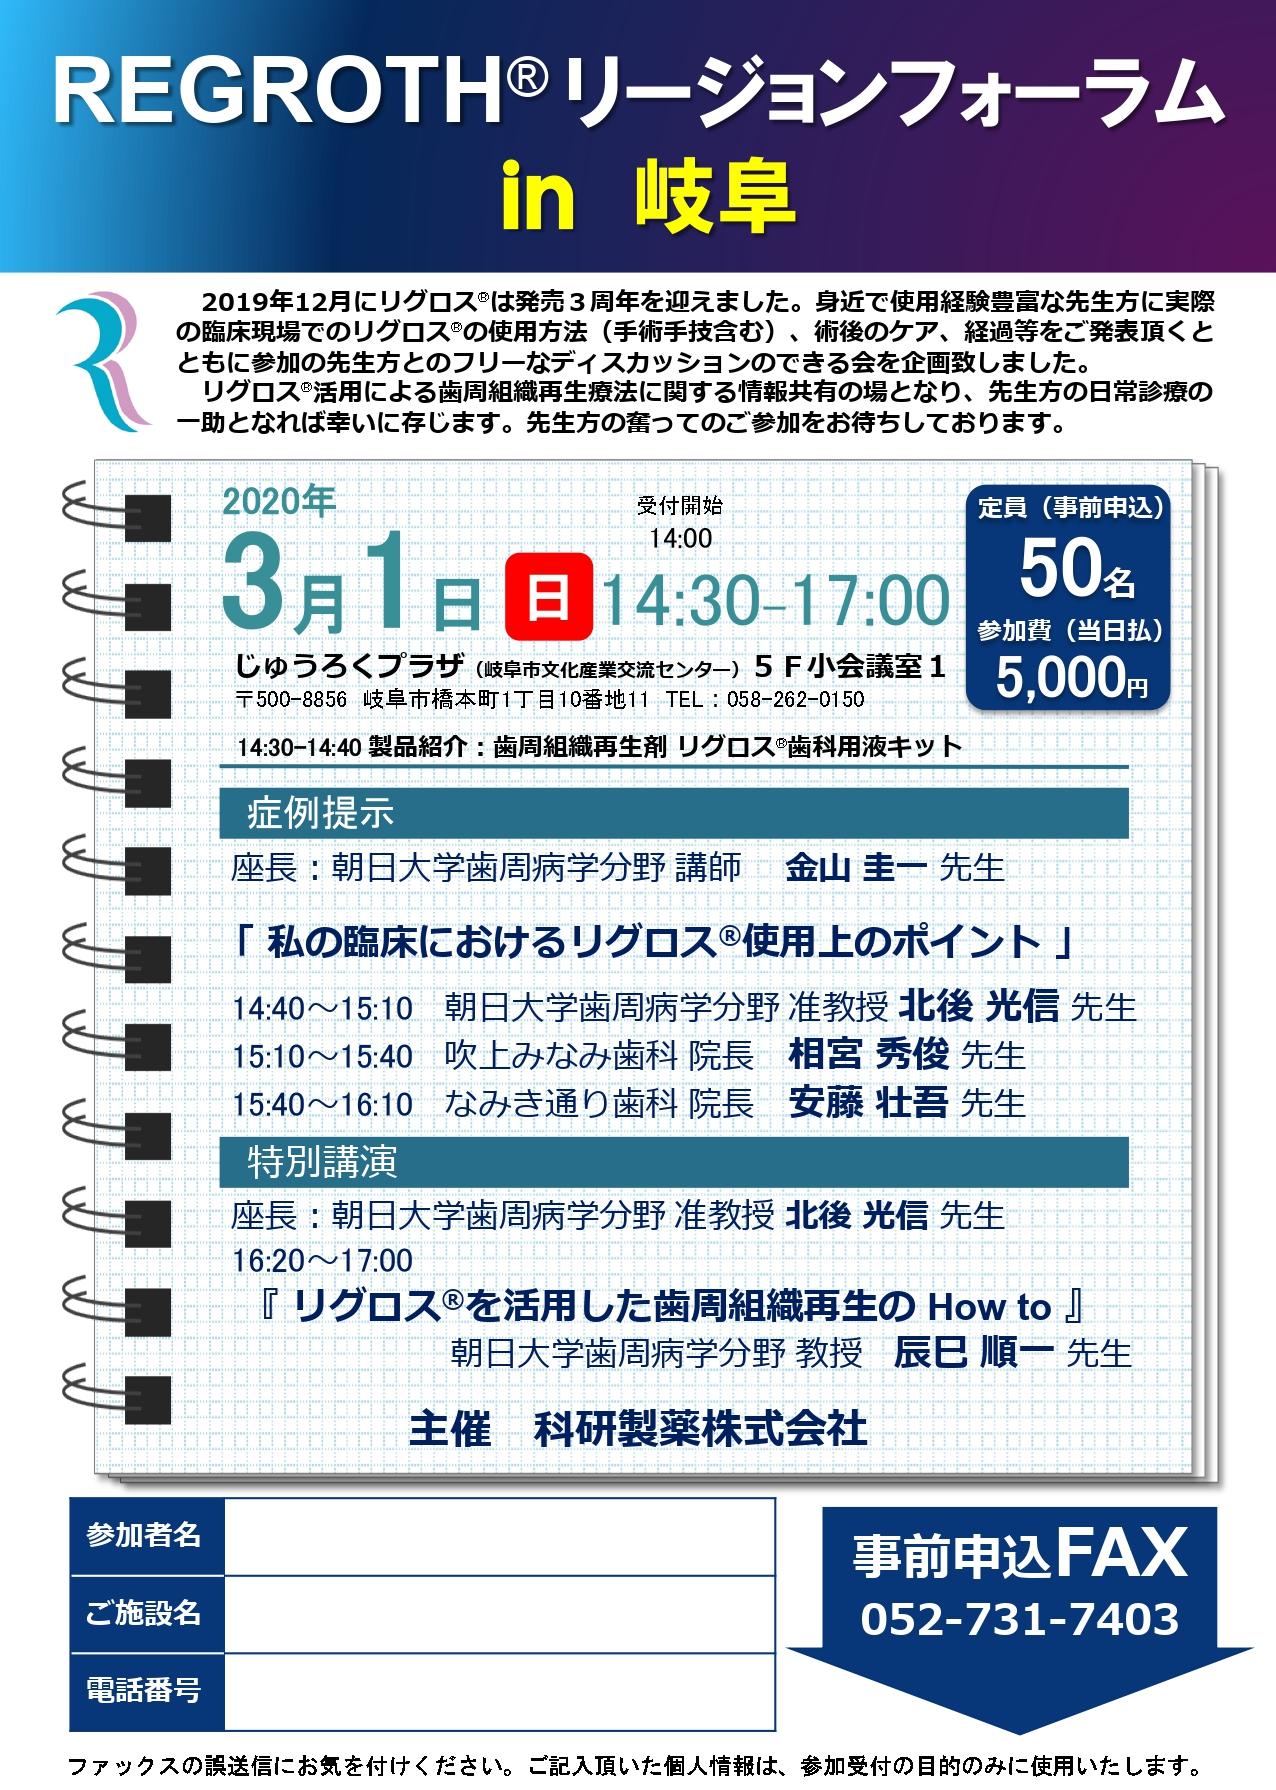 REGROTH® リージョンフォーラム in 岐阜